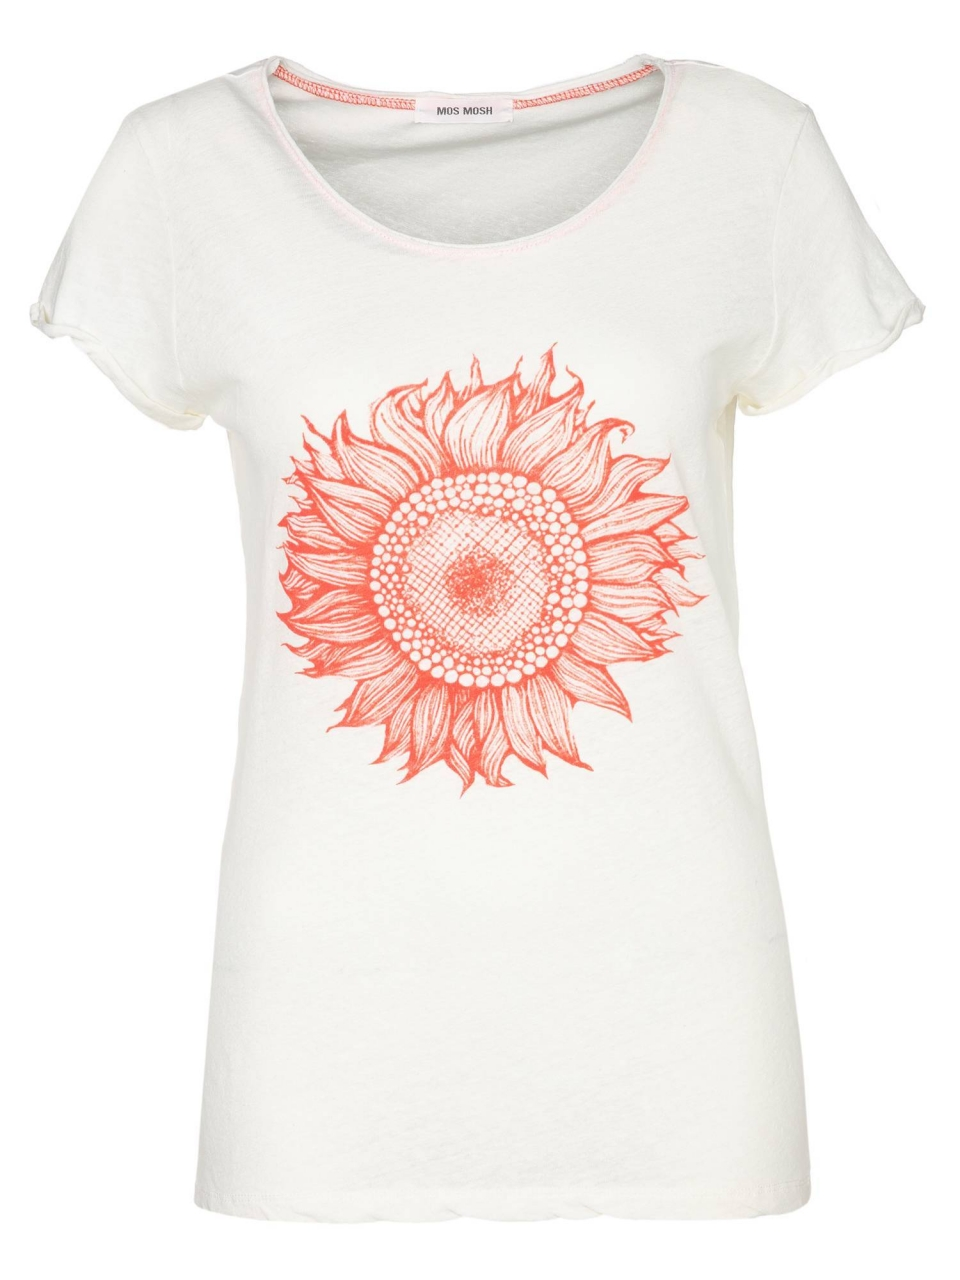 Mos Mosh T-Shirt Sun Tee